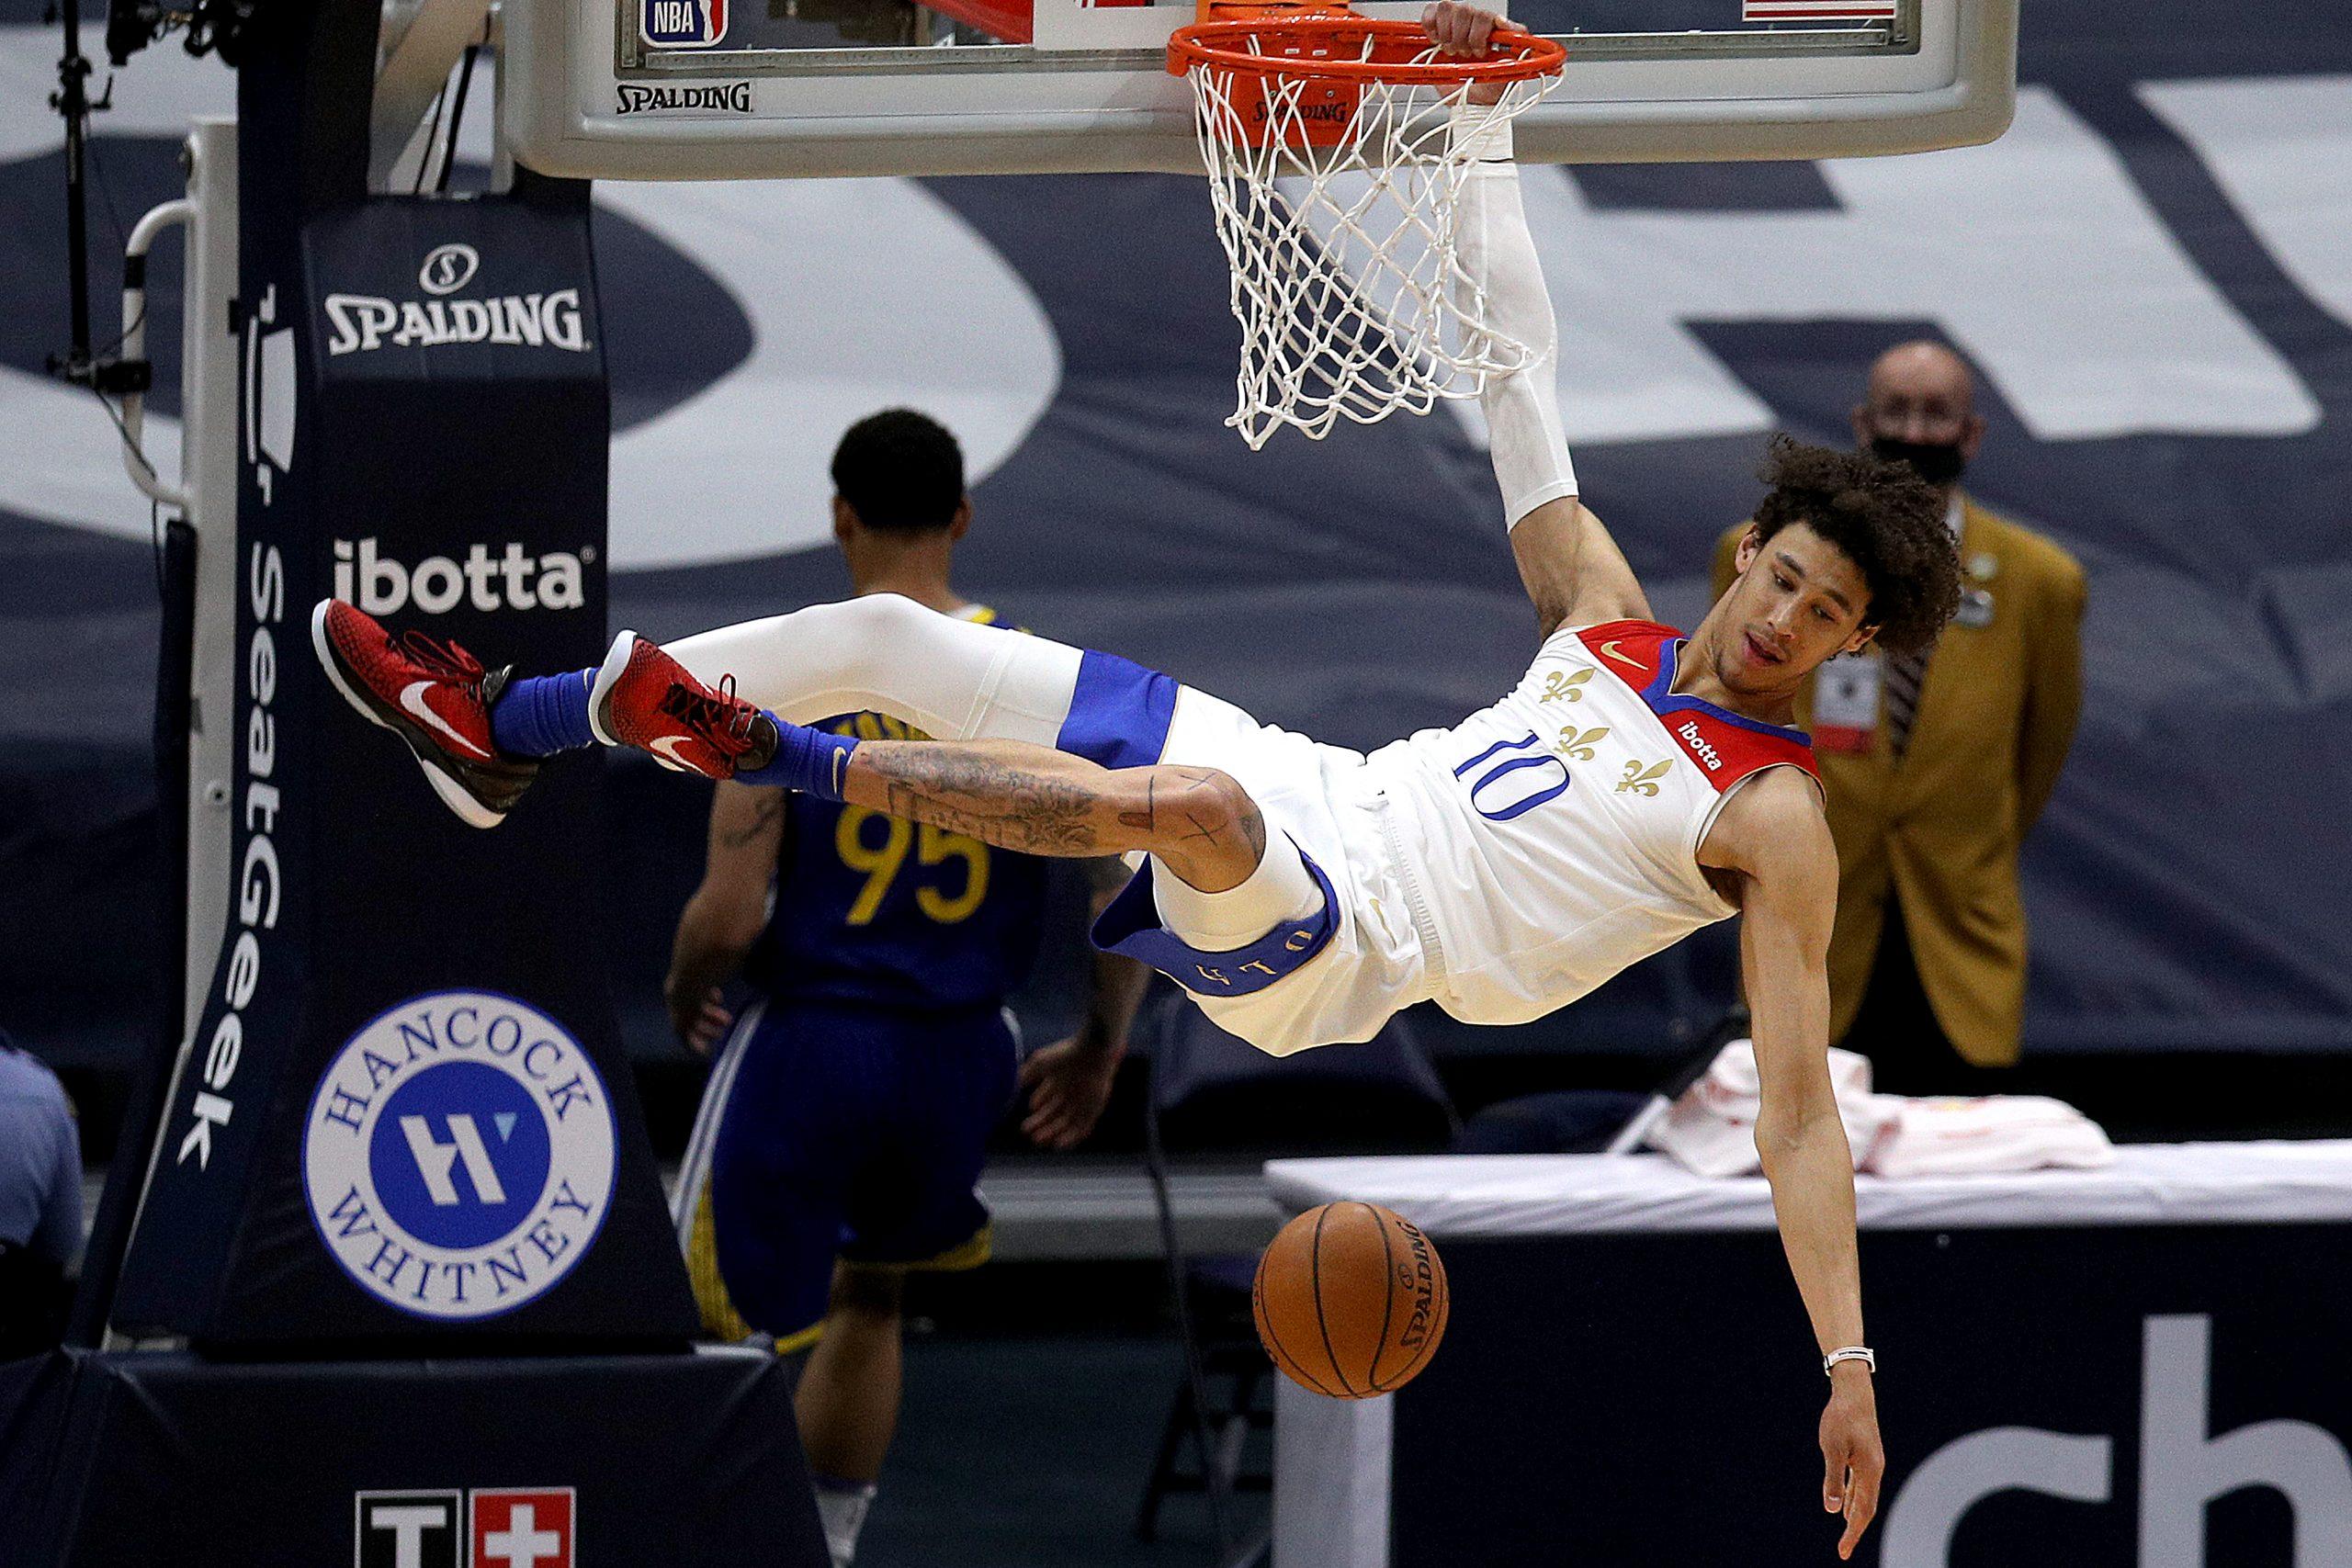 Draft NBA 2021 – Cade Cunningham w Pistons, Green w Rockets, Mobley w Cavs